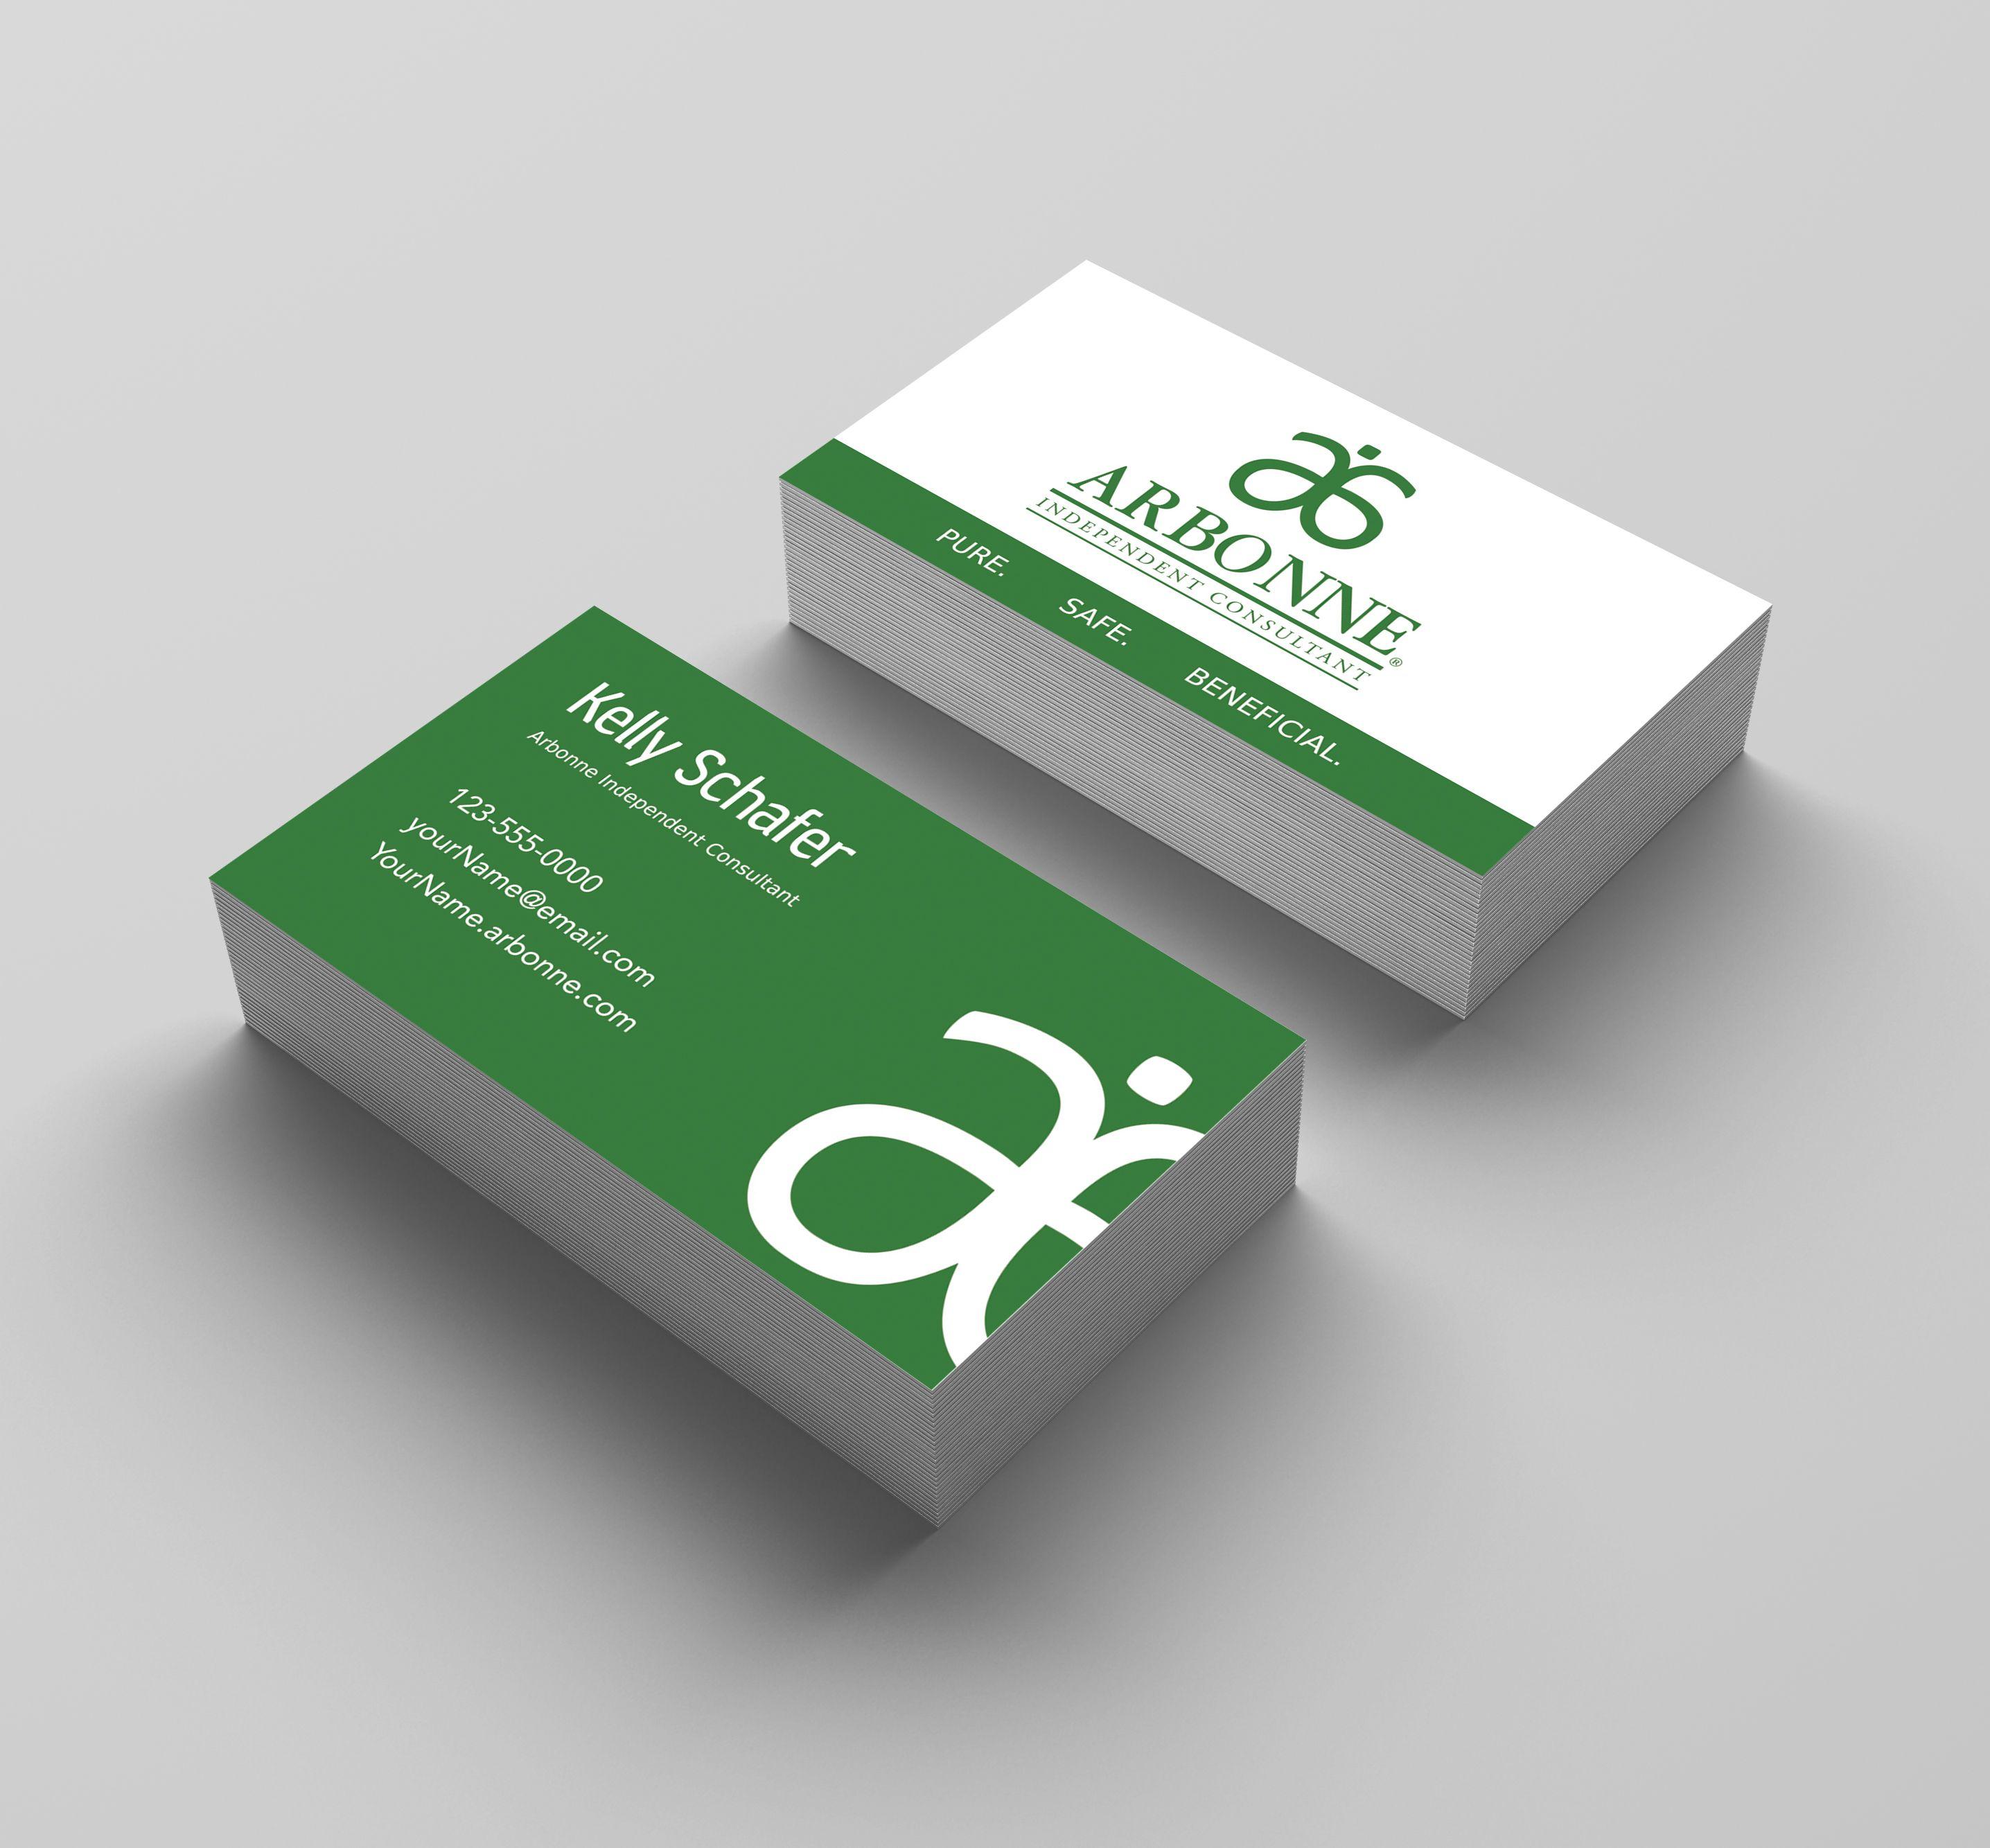 Arbonne Business Card Green Kakaodesigns Arbonne Business Cards Young Living Business Cards Classic Business Card